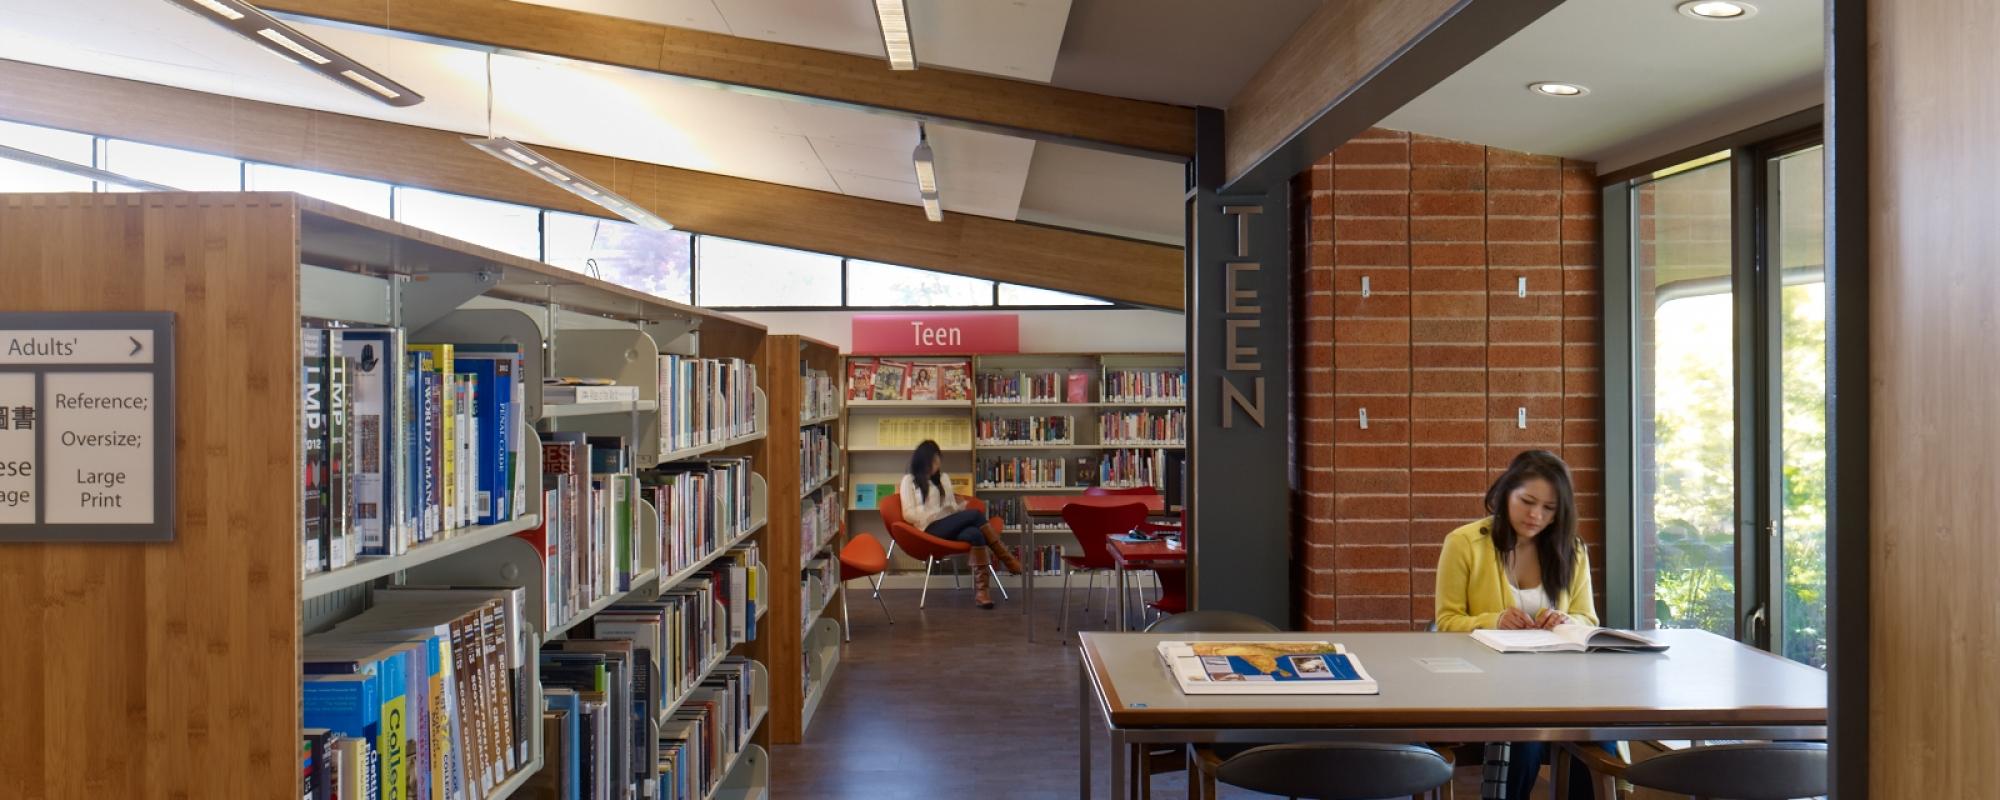 Merced Branch Library